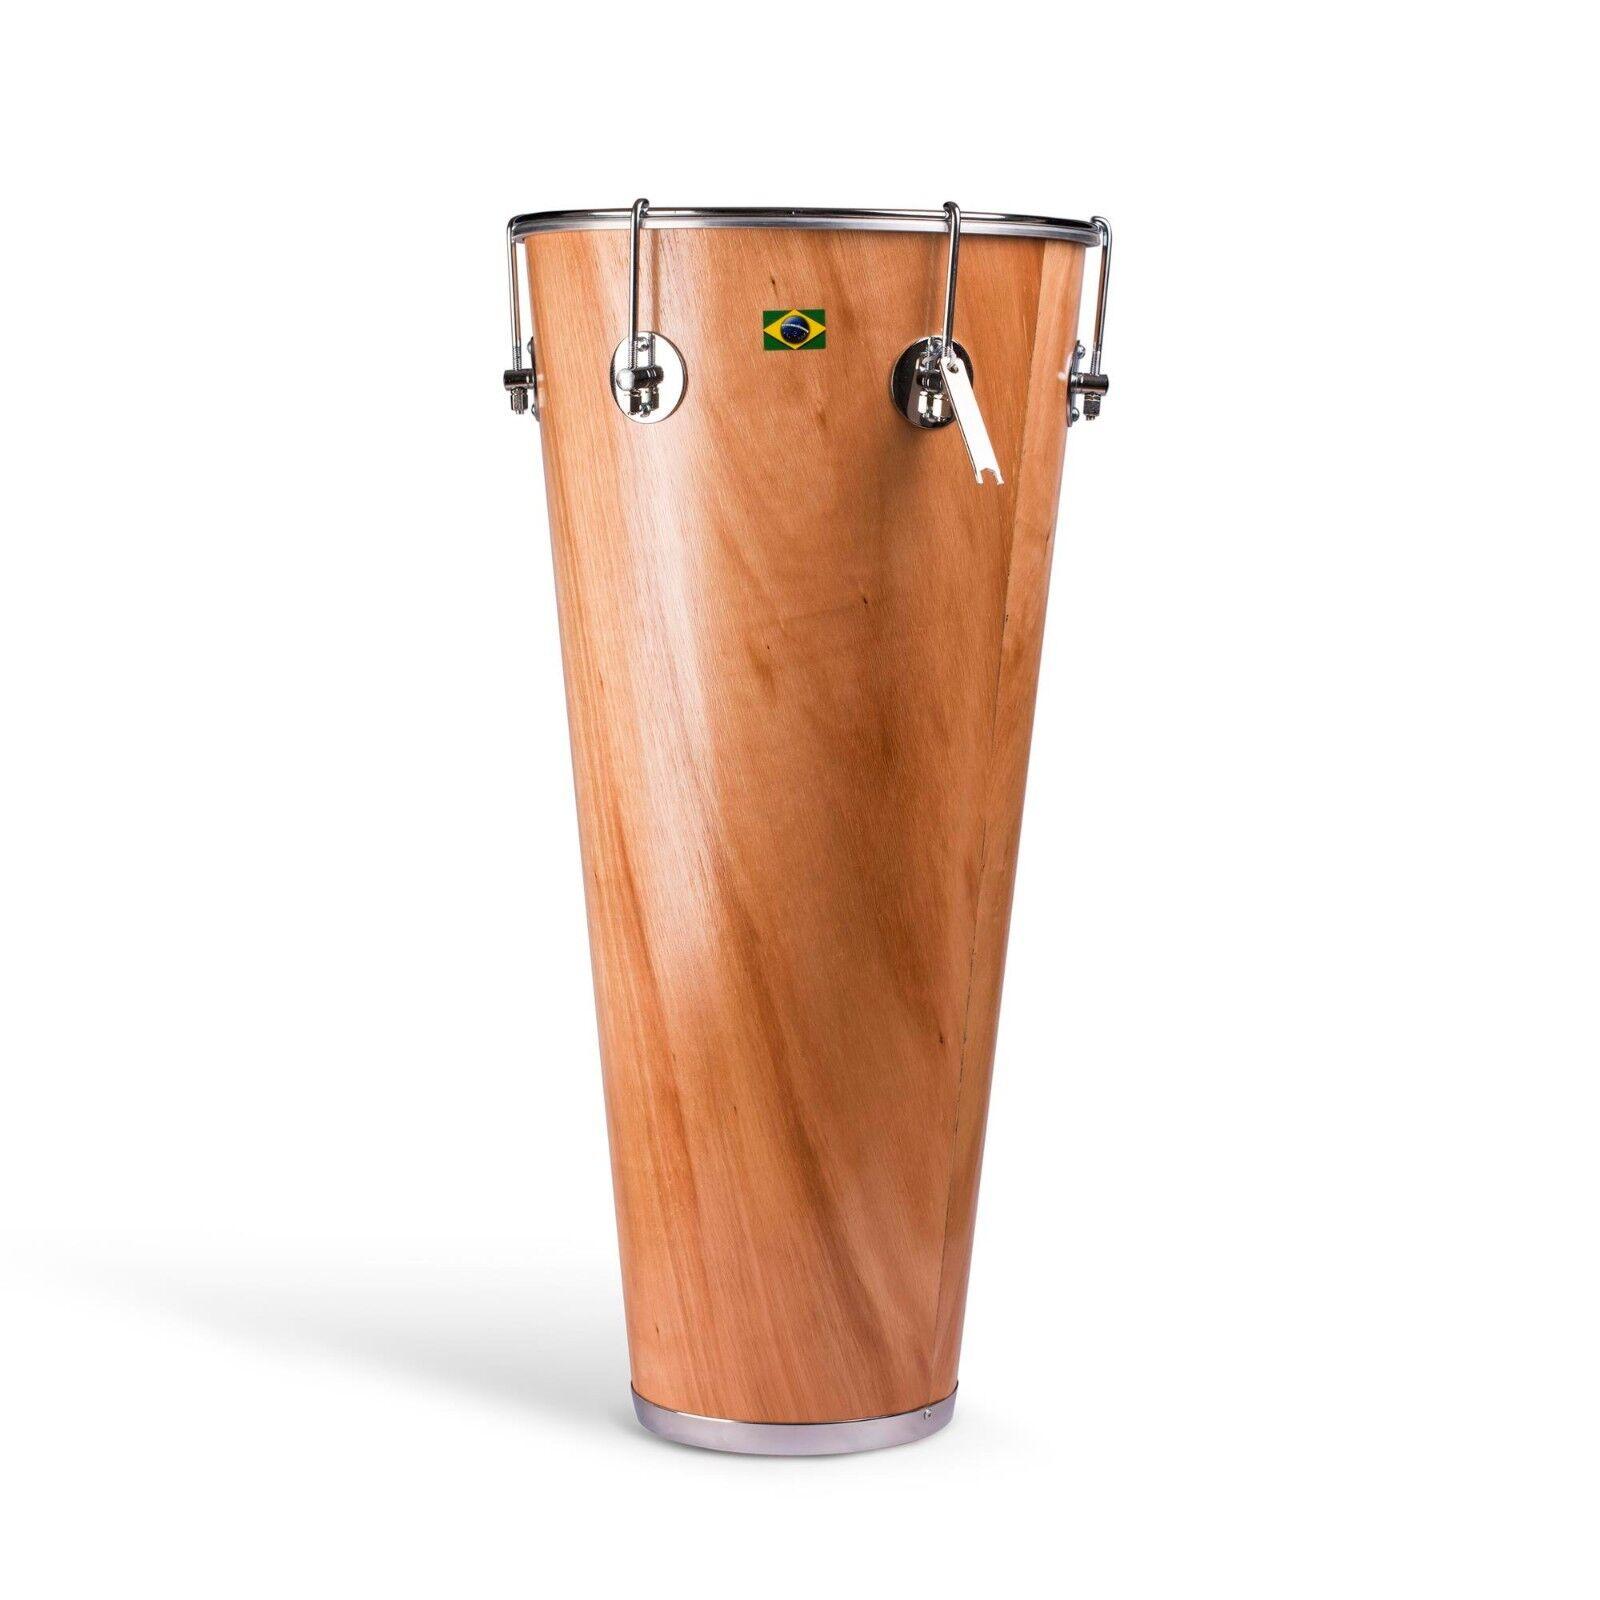 Brasilian Cuban Timba Natural Wood Drum Salsa Samba Music Instrument 4 Sizes